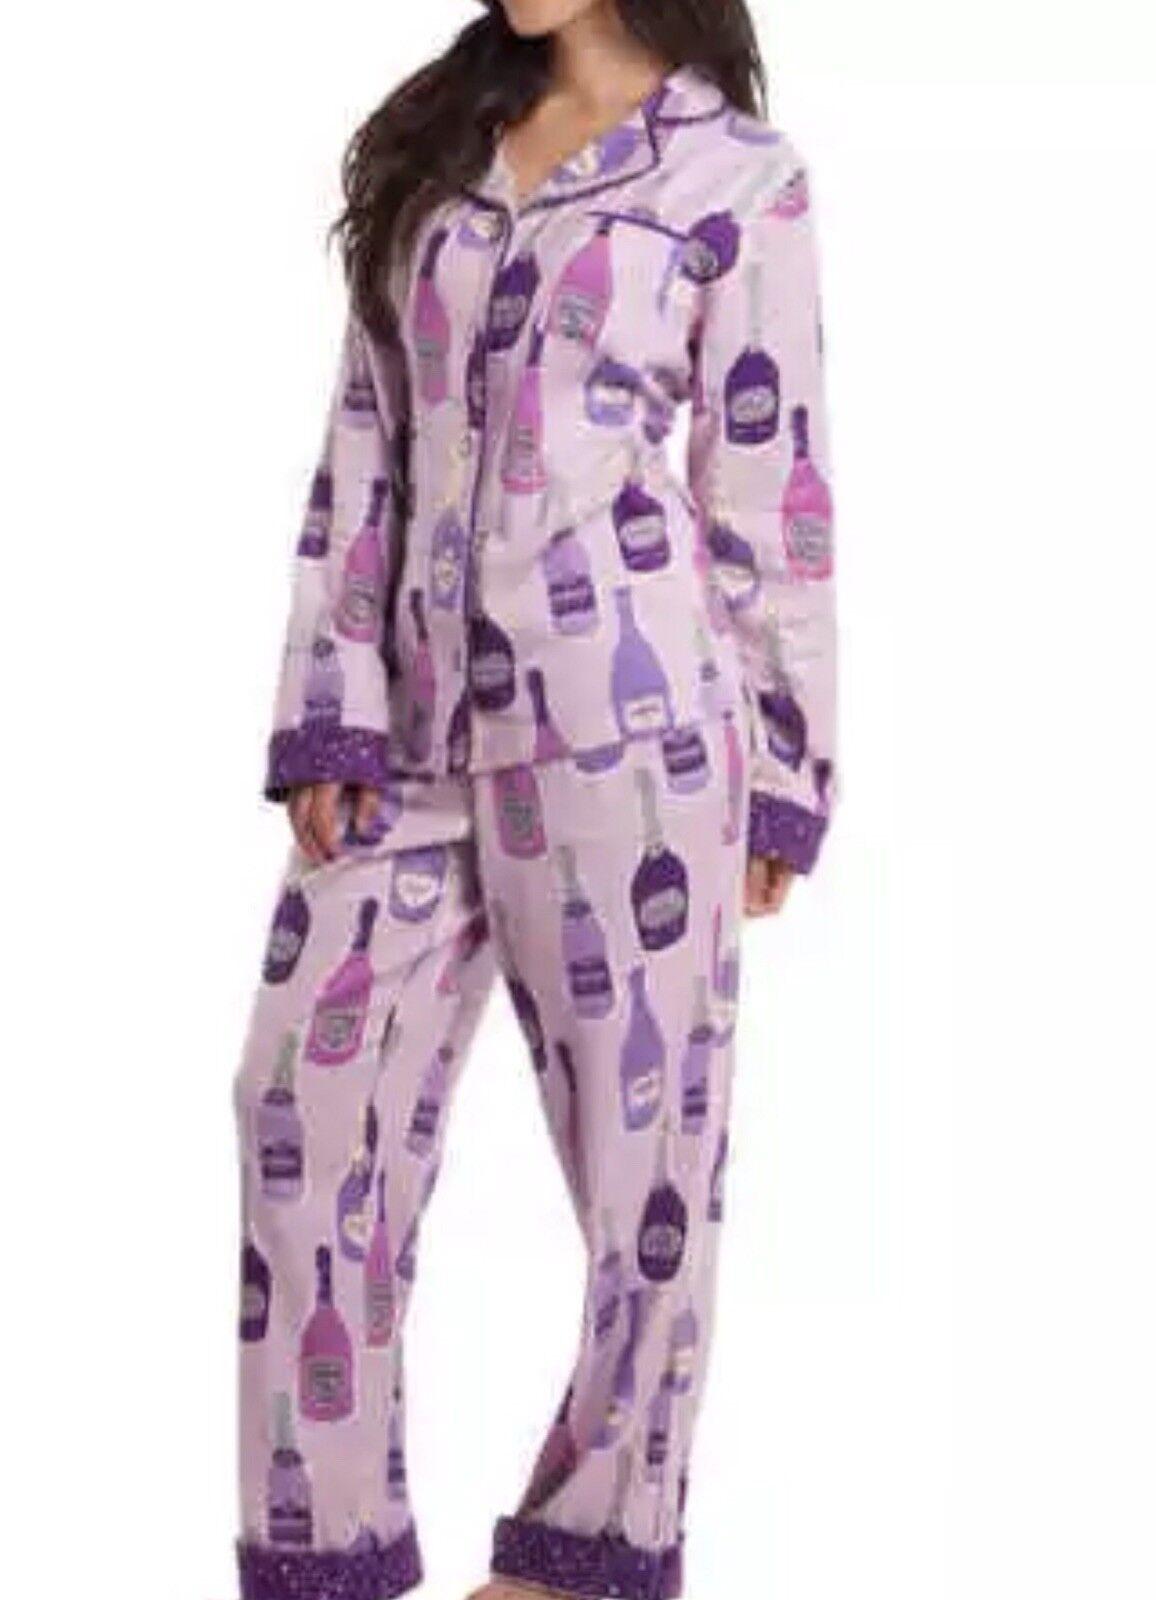 New Pink Flannel PJ's My Munki Munki 2 Piece Set